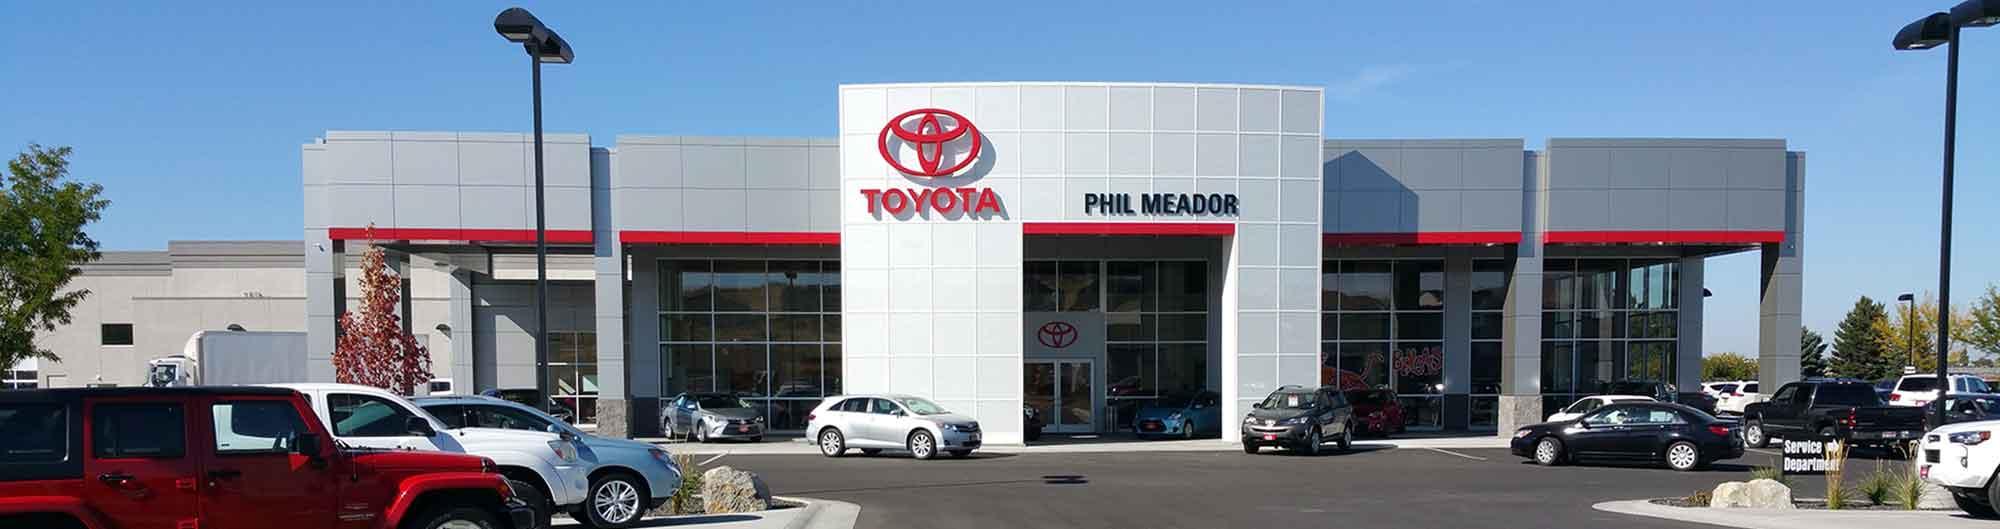 Used Car Dealerships Idaho Falls >> New & Used Ford, Lincoln, Subaru & Toyota Dealerships ...